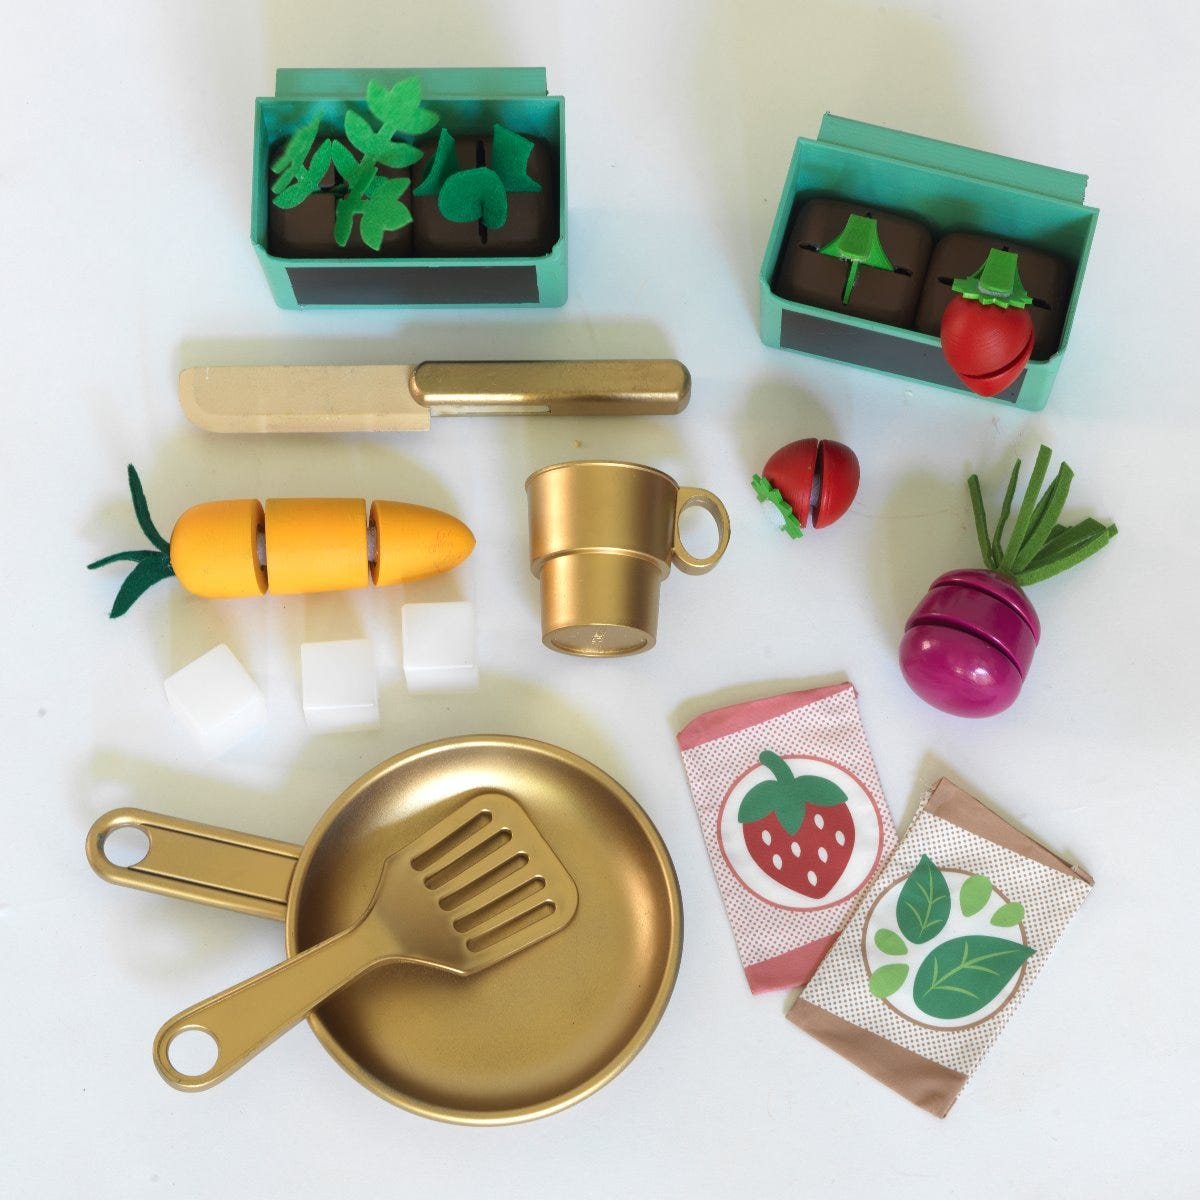 KidKraft детска кухня за игра с градина на терасата-bellamiestore